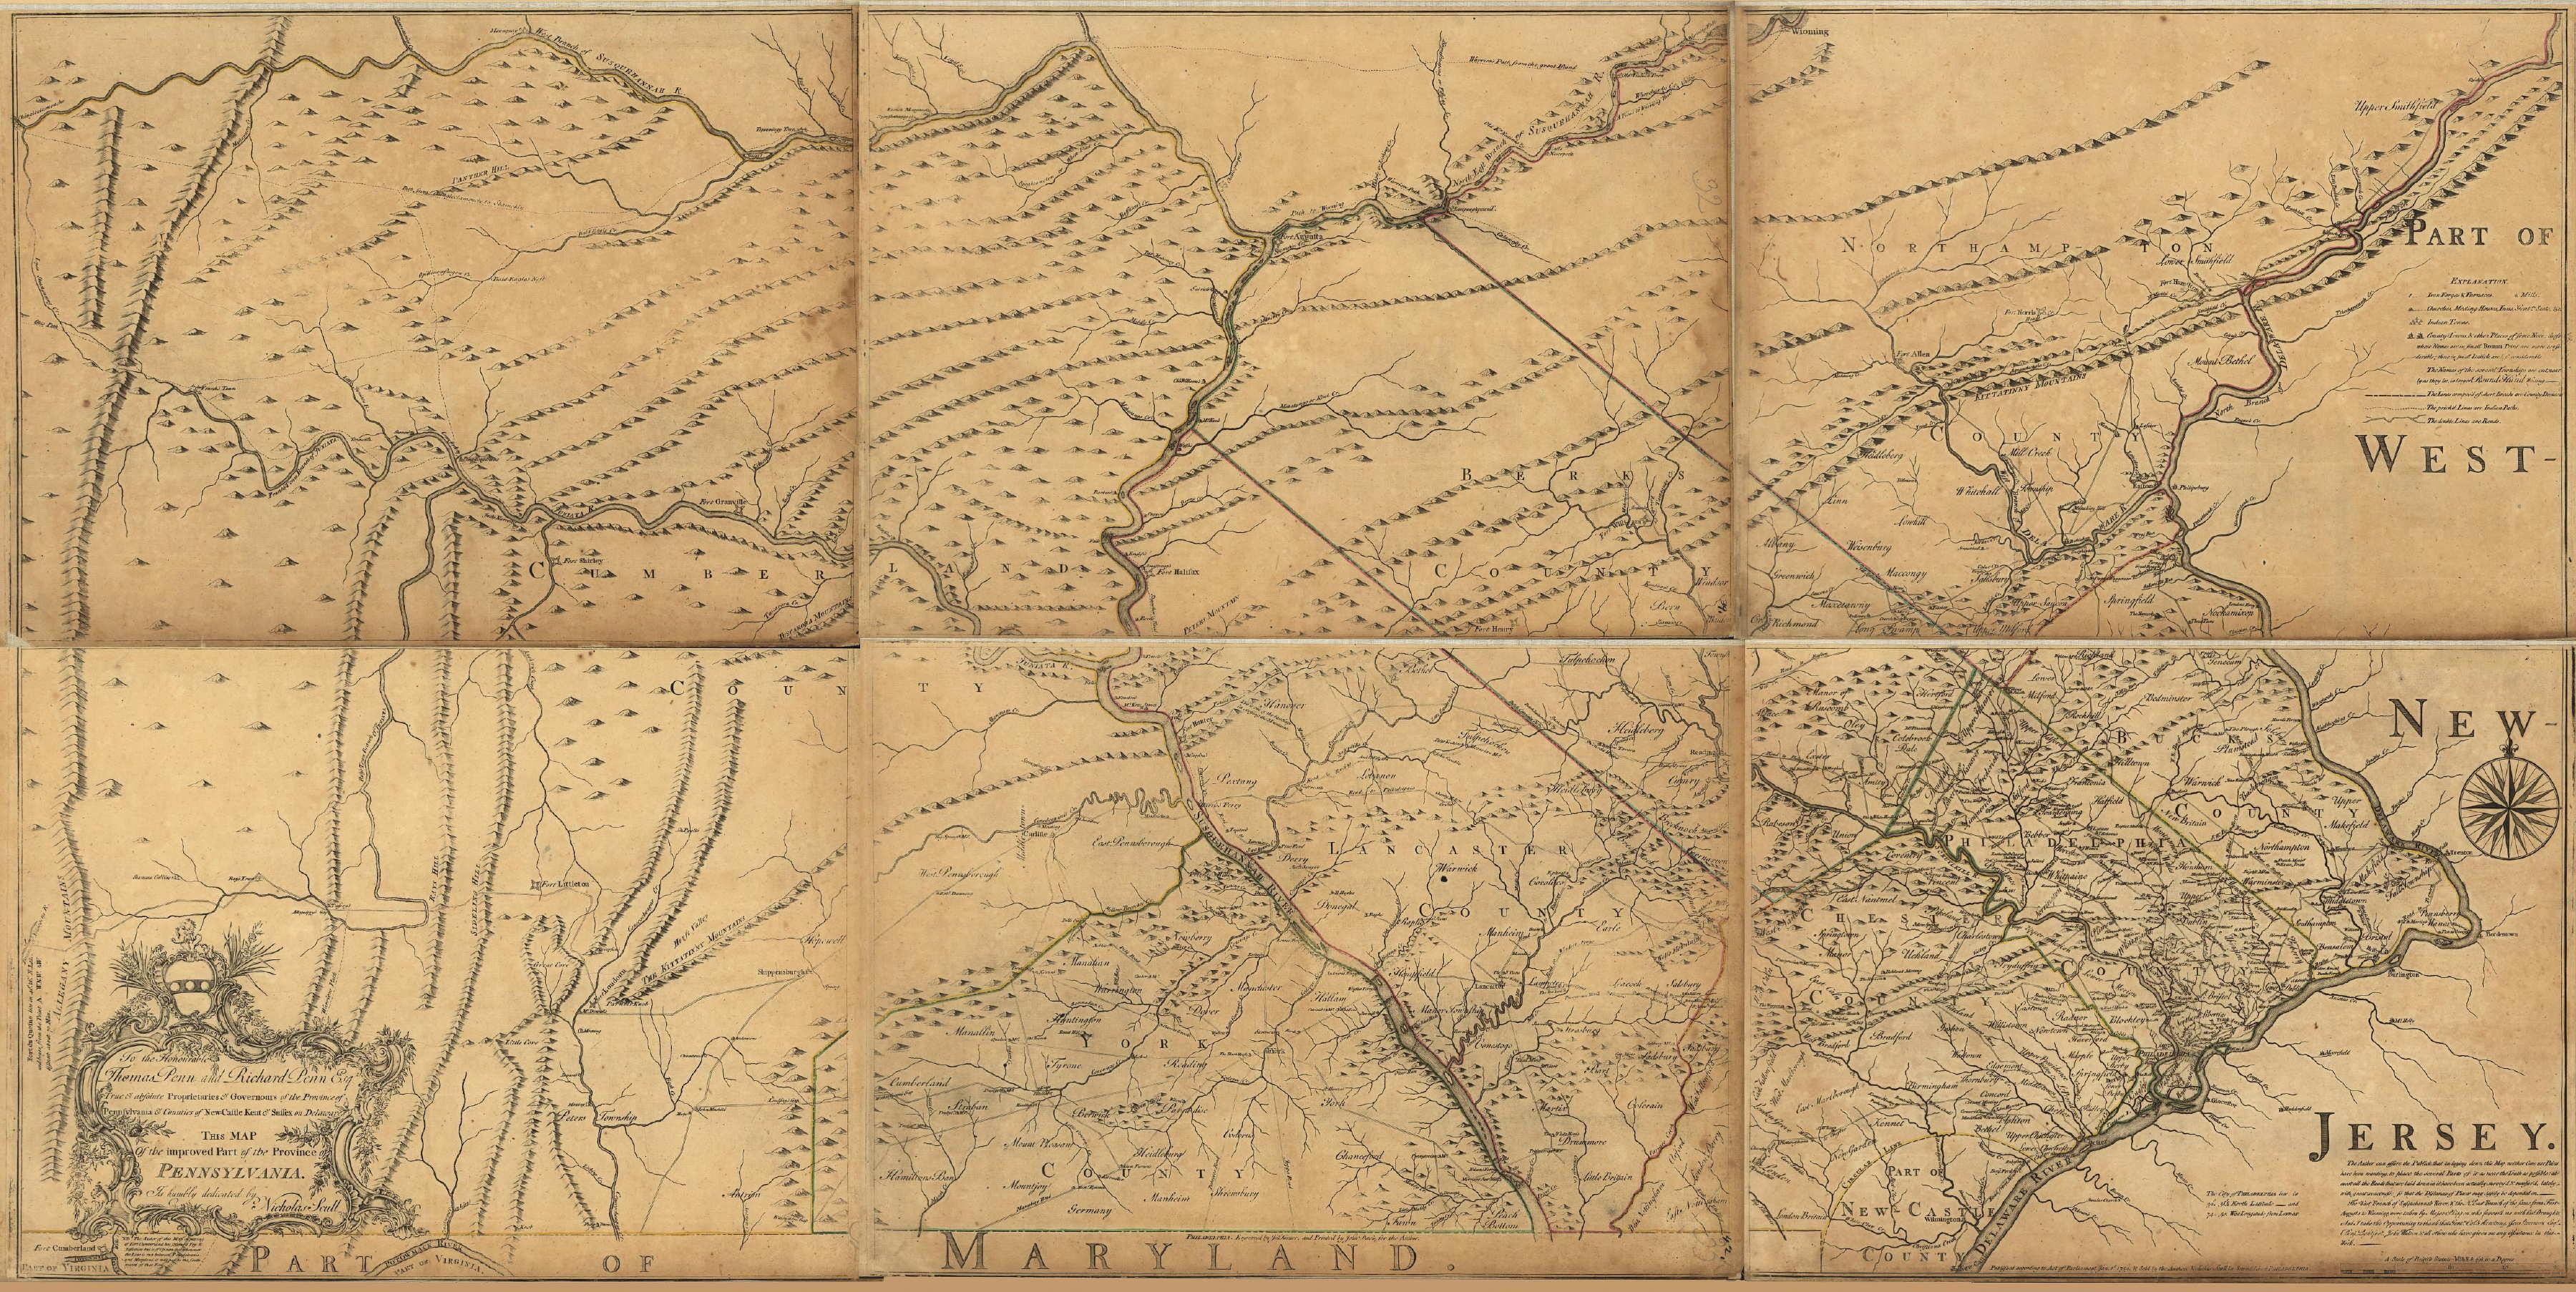 PAgenealogy.net : Pennsylvania Historical Maps on hall county ga road map, philadelphia pa road map, reading pa road map, centre county pa road map, clarion county pa road map, eagle county co road map, camden county nj road map, norristown pa road map, northumberland county pa road map, york pa city map, adams county pa road map, northampton county pa road map, york county townships, mckean county pa road map, williamsport pa road map, snyder county road map, penn township pa road map, orange county ca road map, york pennsylvania, kern county ca road map,